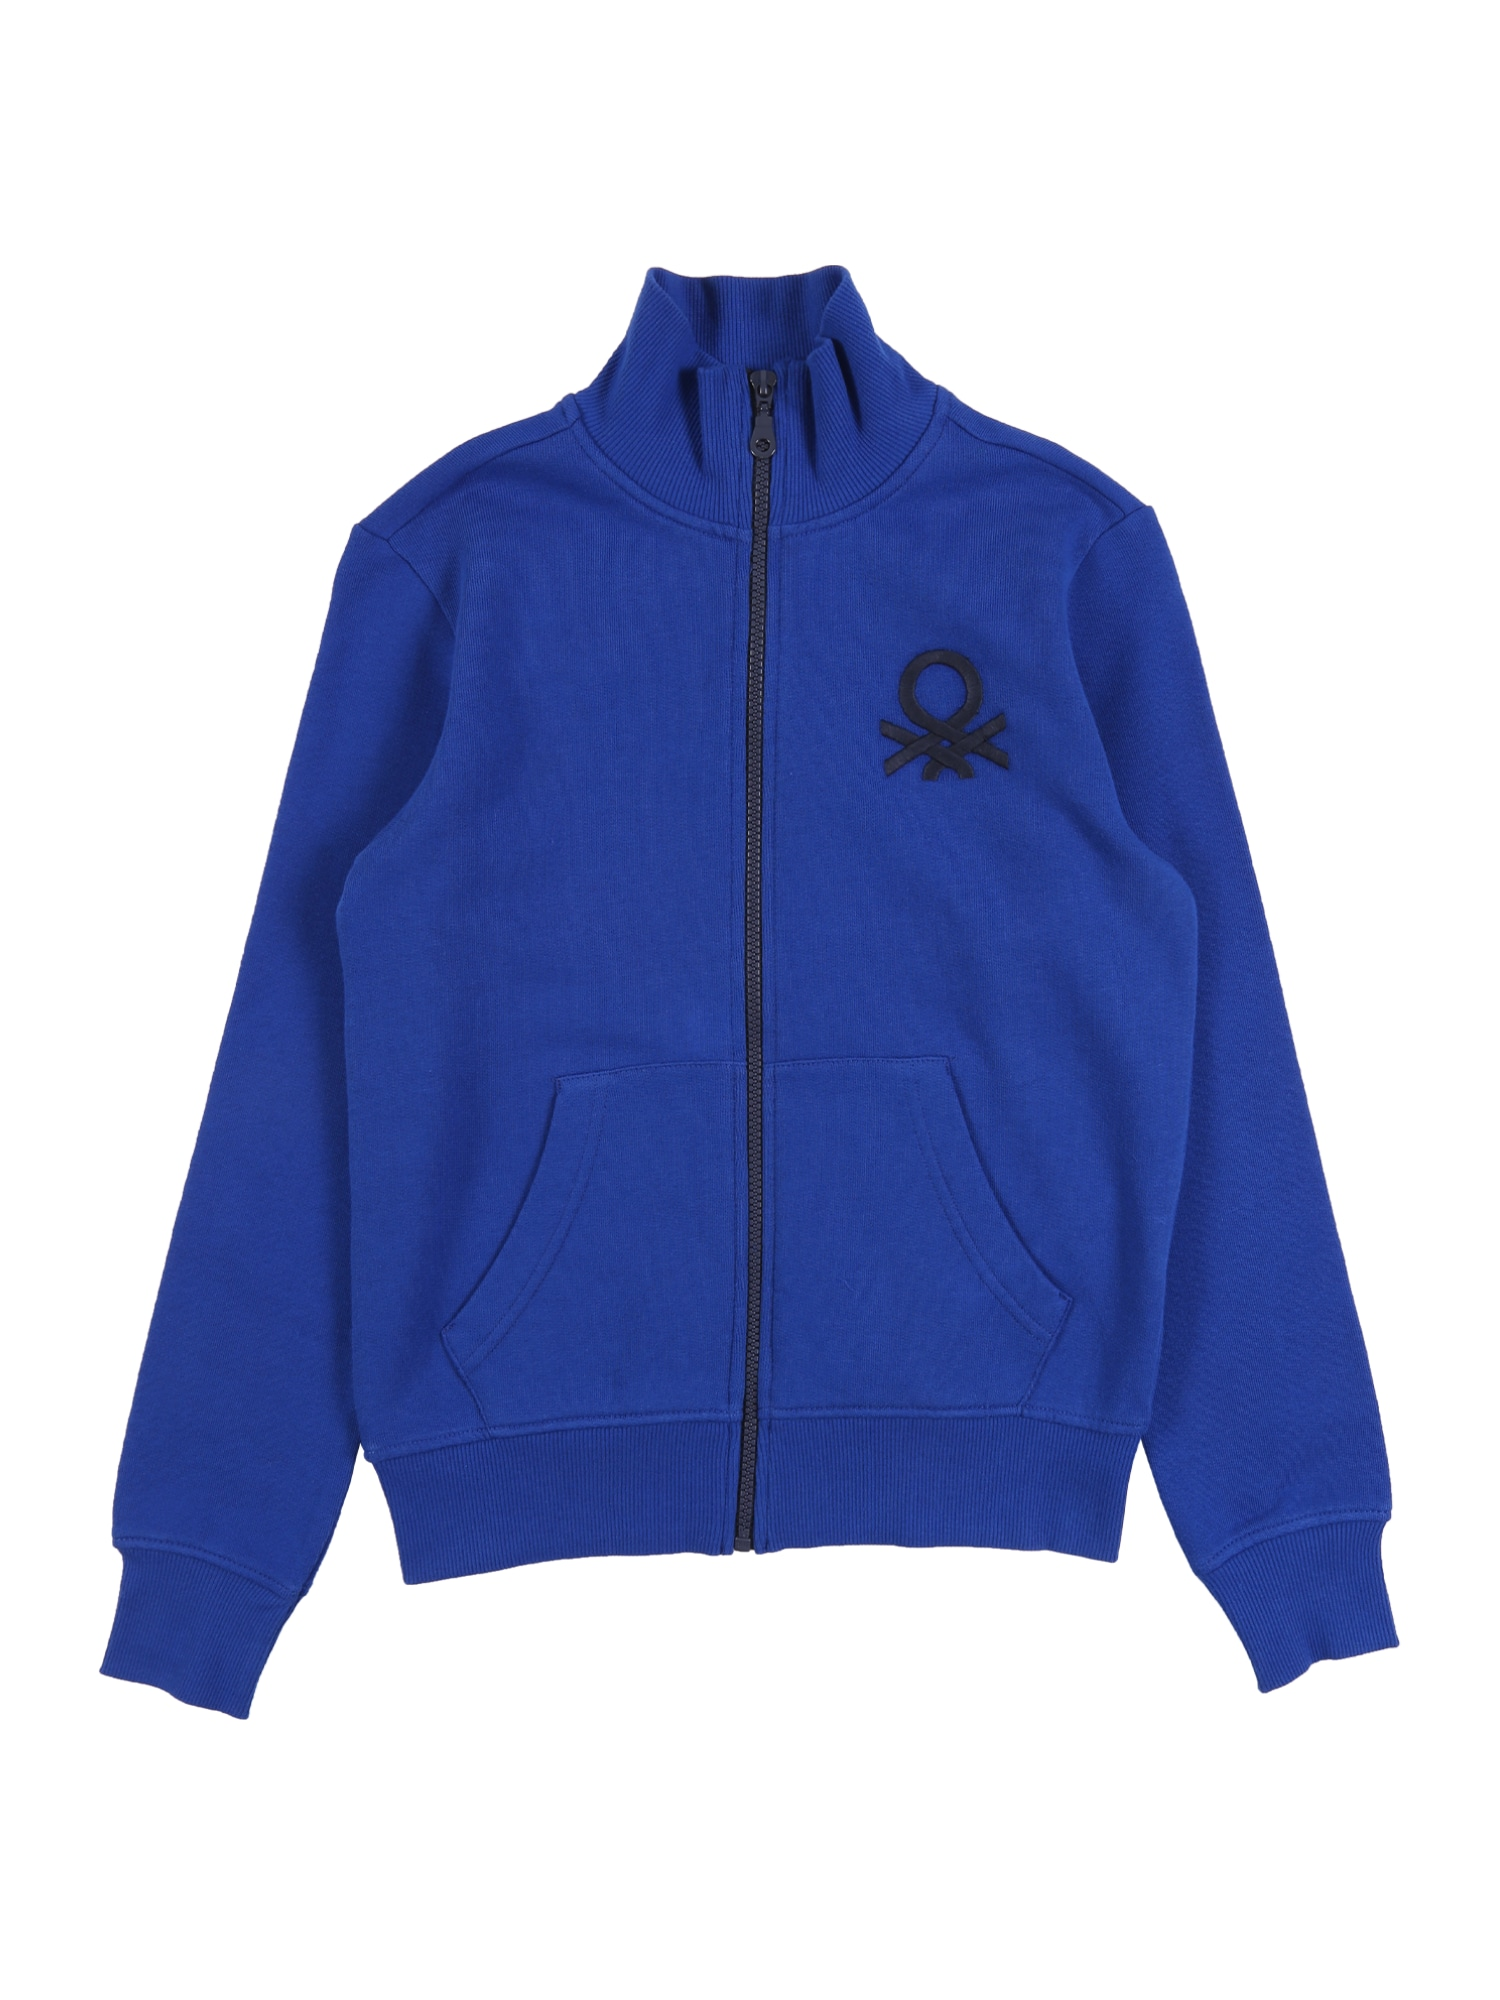 UNITED COLORS OF BENETTON Džemperis mėlyna